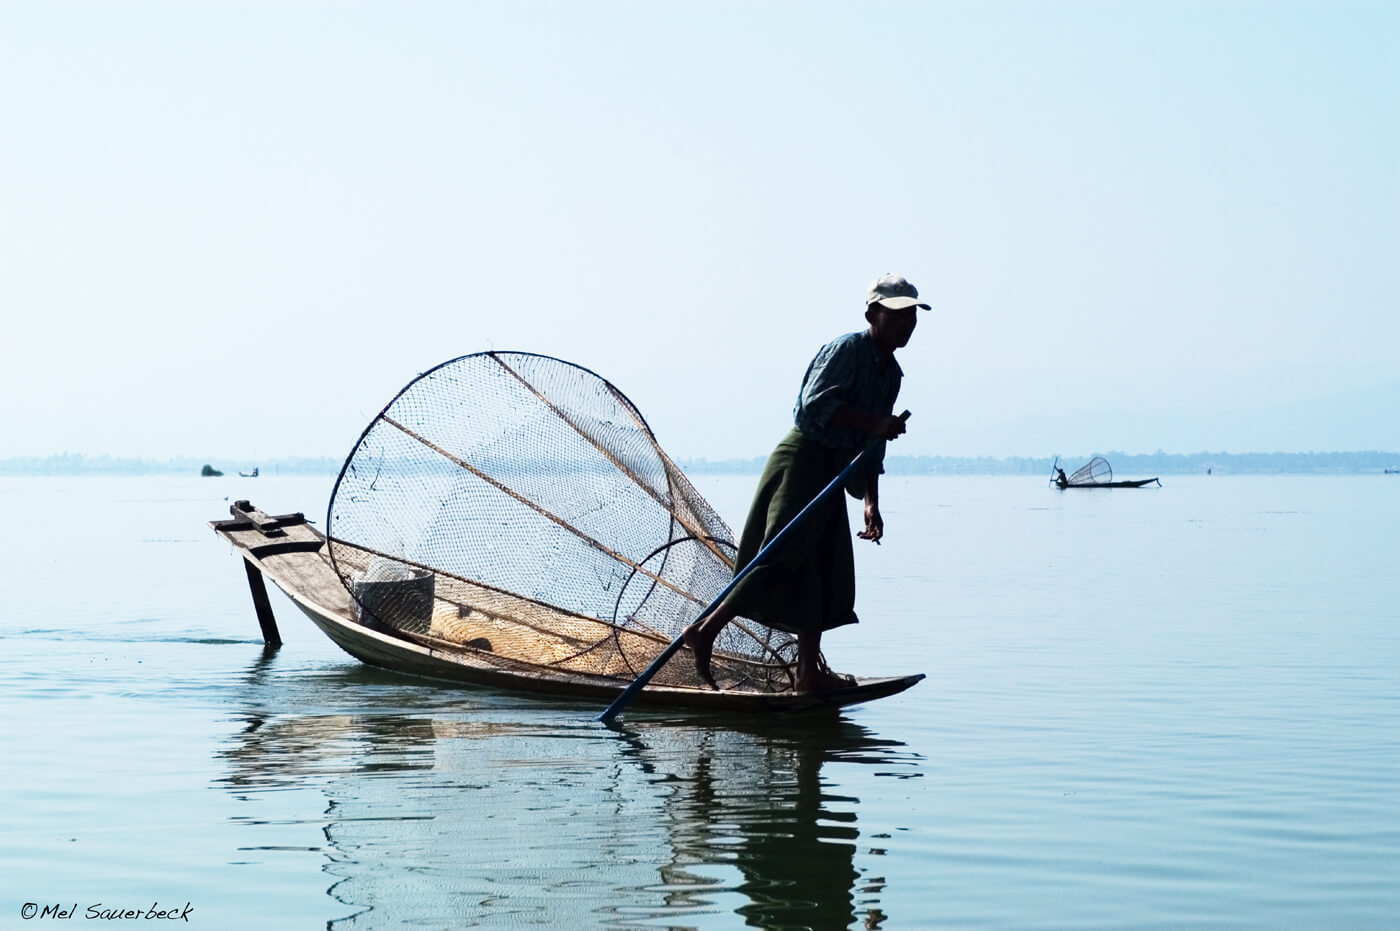 Man on boat, Inlay Lake, Myanmar, Burma